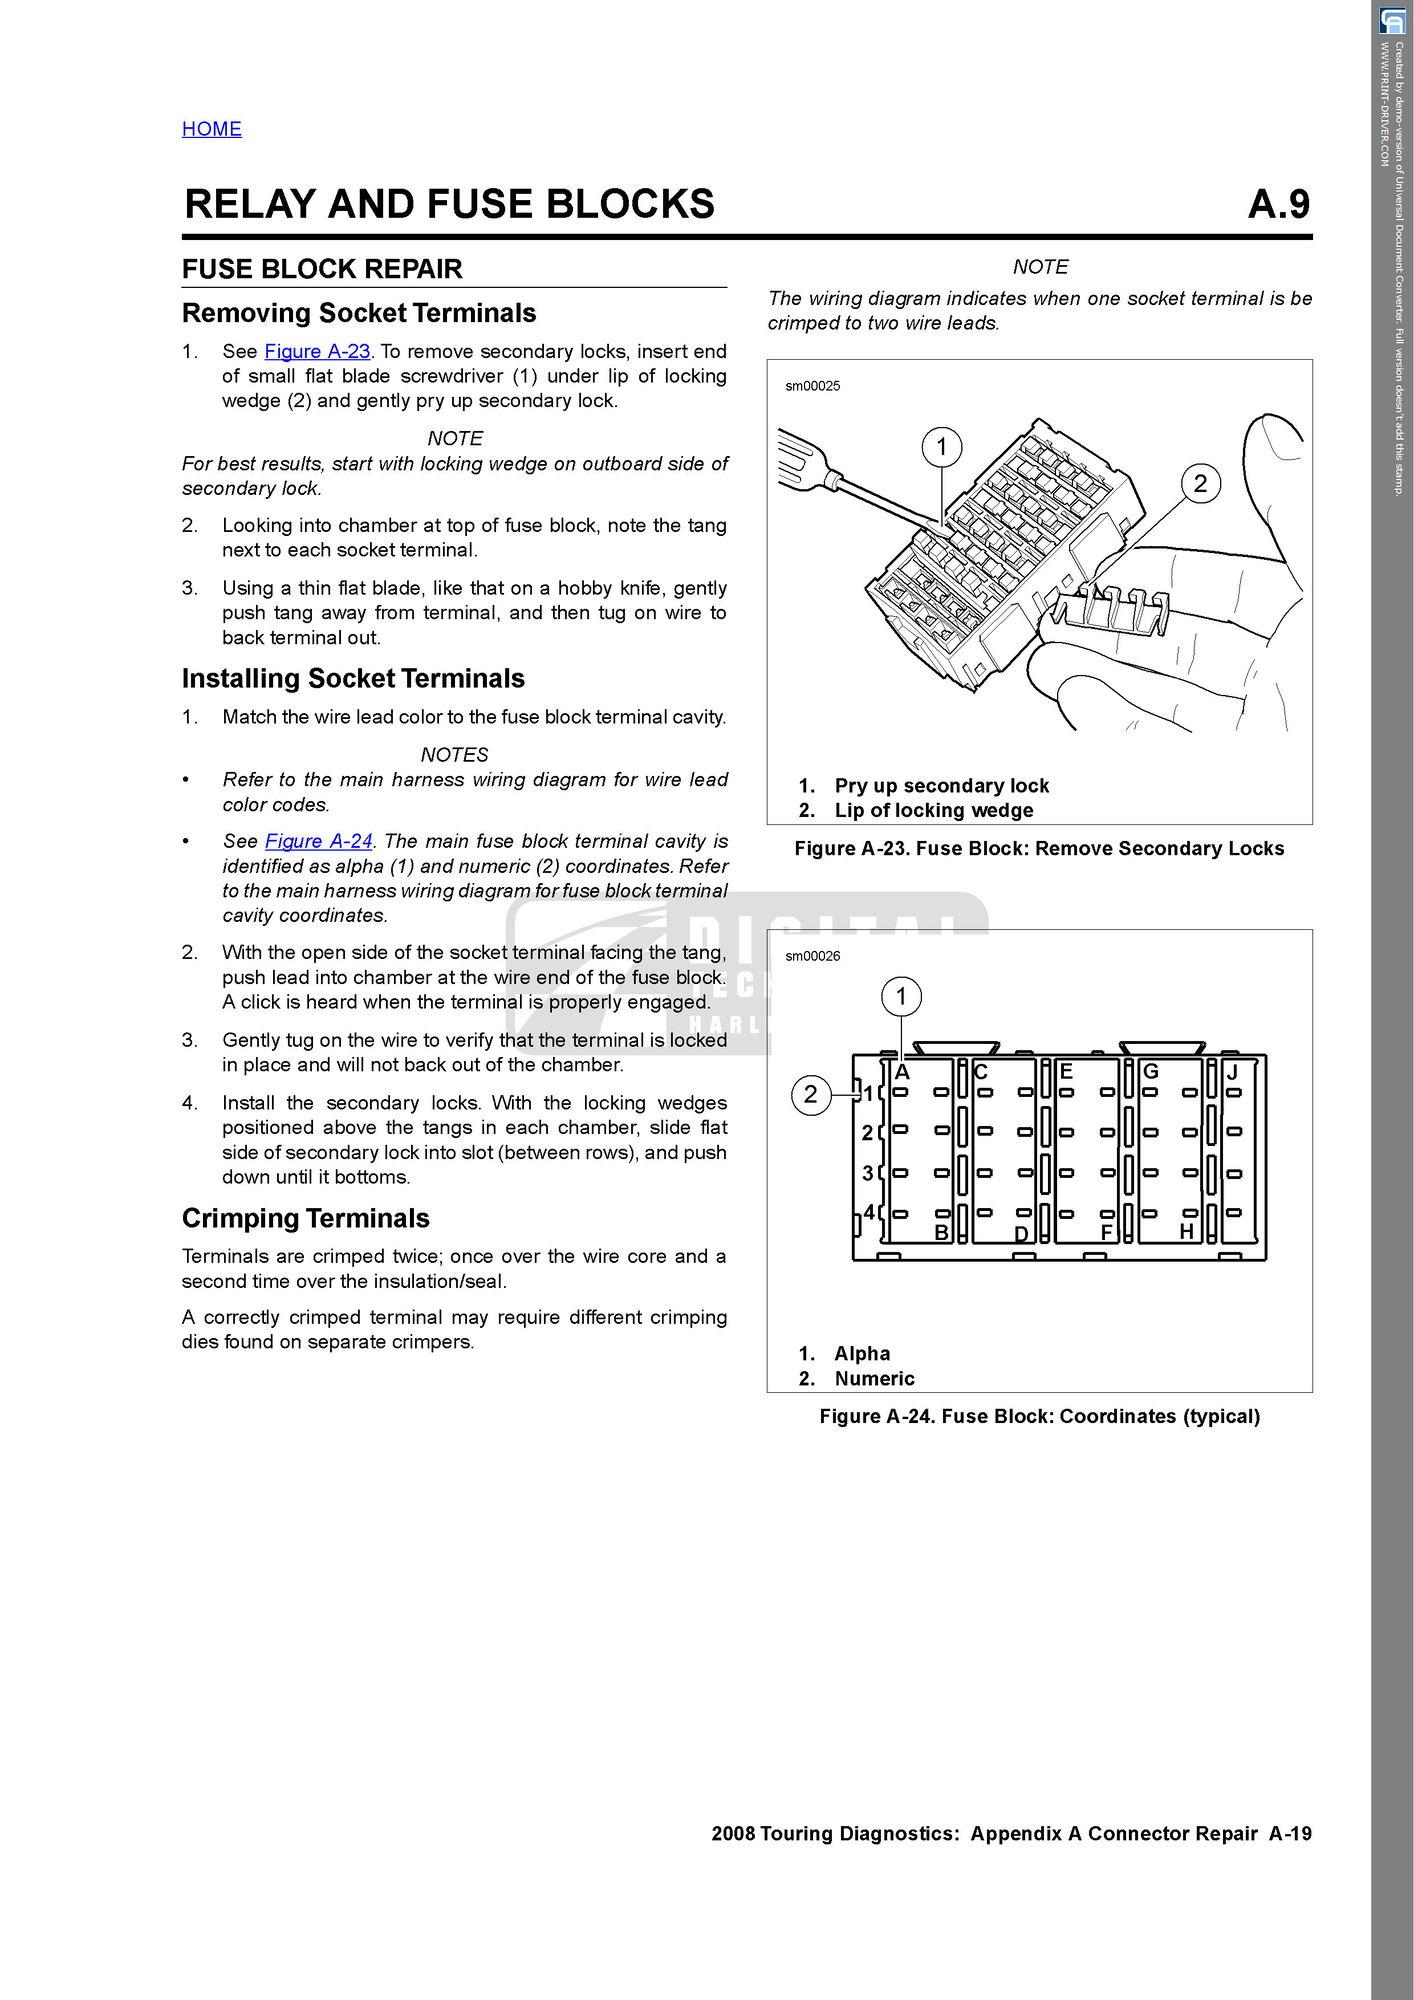 electrical manual genius page 2 harley davidson forums Car Electrical Diagnostics Richardson Diagnostics for All